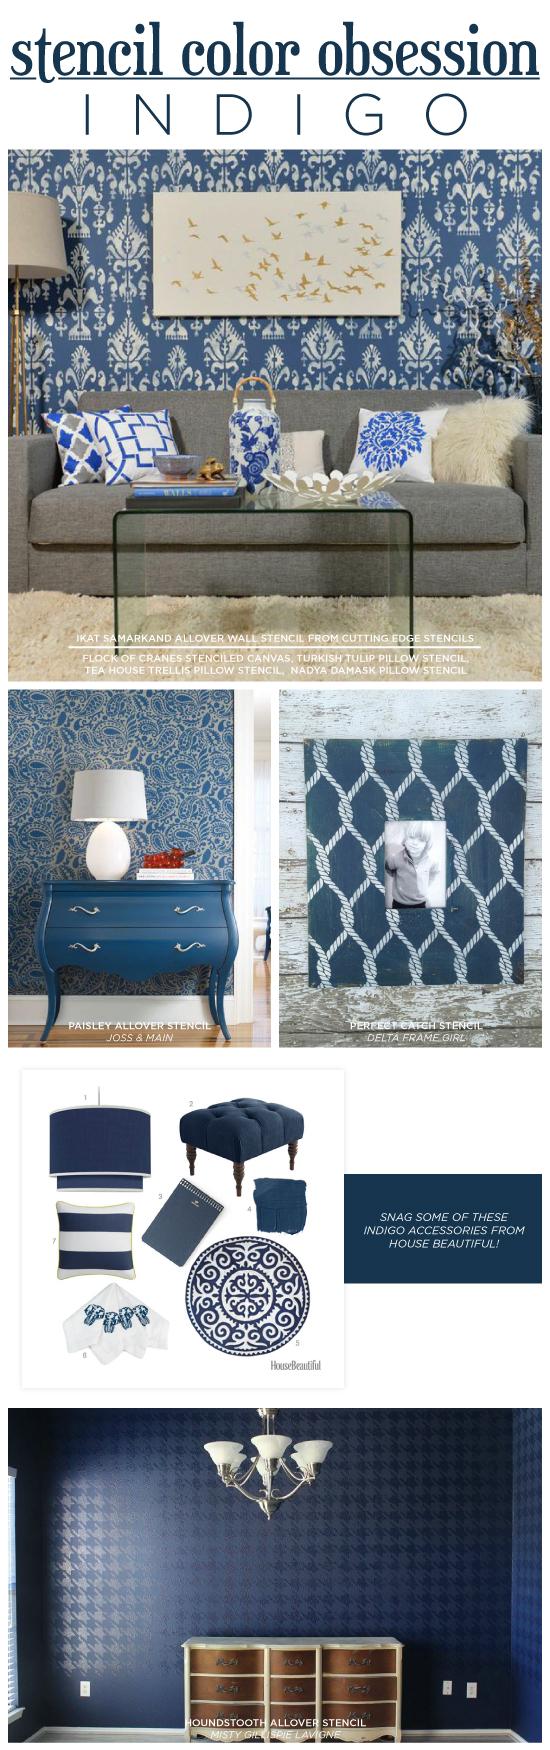 Cutting Edge Stencils shares DIY stenciled accent walls and home decor ideas in indigo blue. http://www.cuttingedgestencils.com/wall-stencils-stencil-designs.html